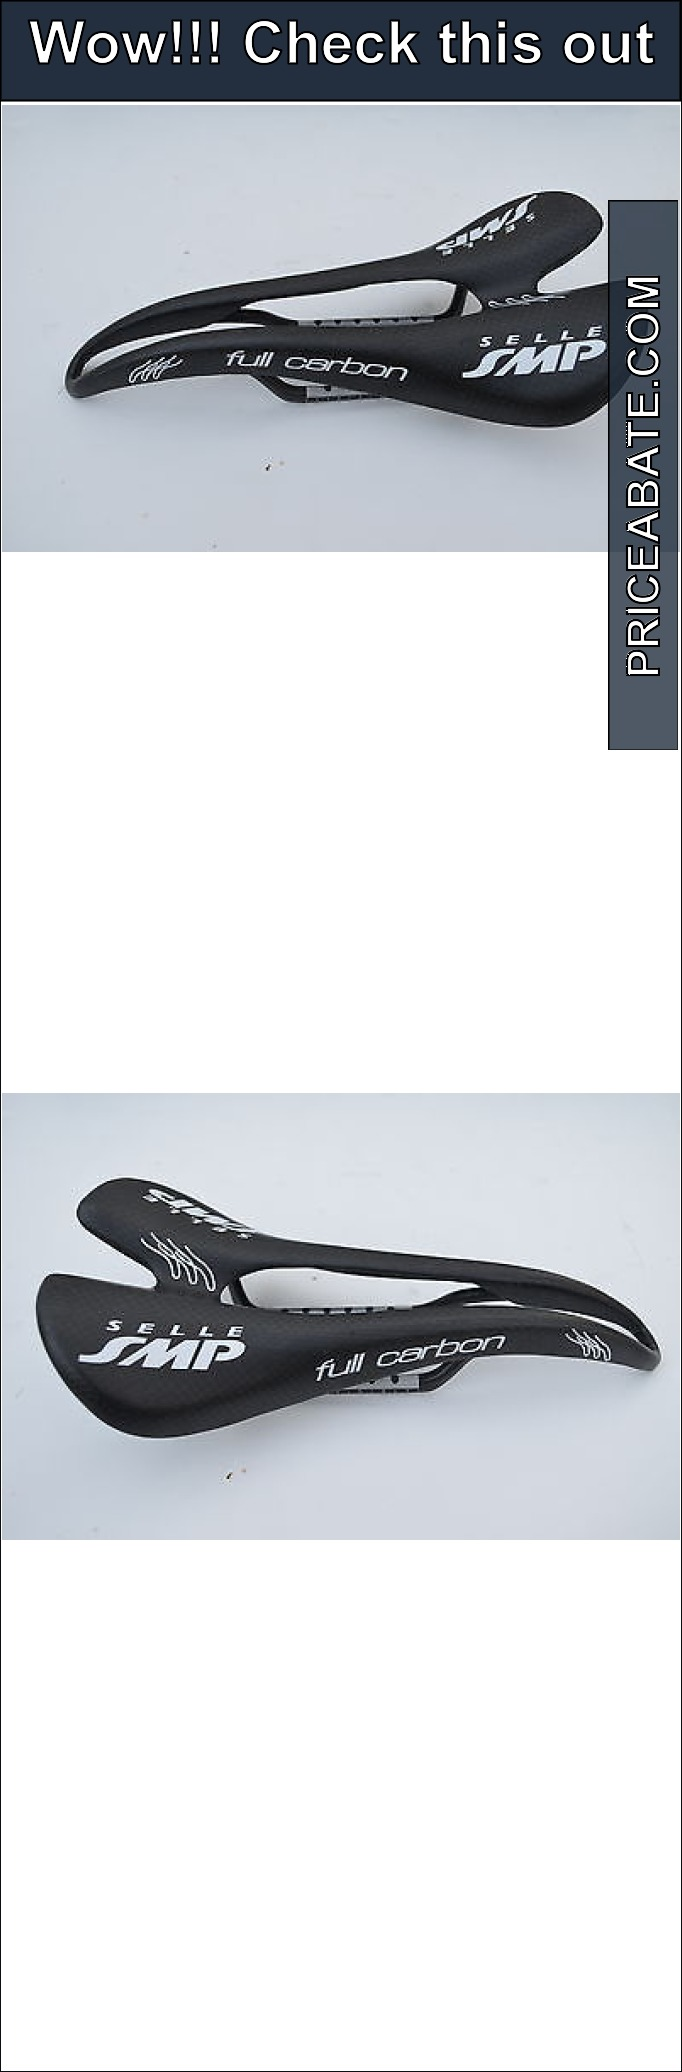 bicycle-parts: New, Selle SMP  Carbon Fiber MTB Road Bike Saddle Seat, Matte Black #Bicycle - New, Selle SMP  Carbon Fiber MTB Road Bike Saddle Seat, Matte Black...